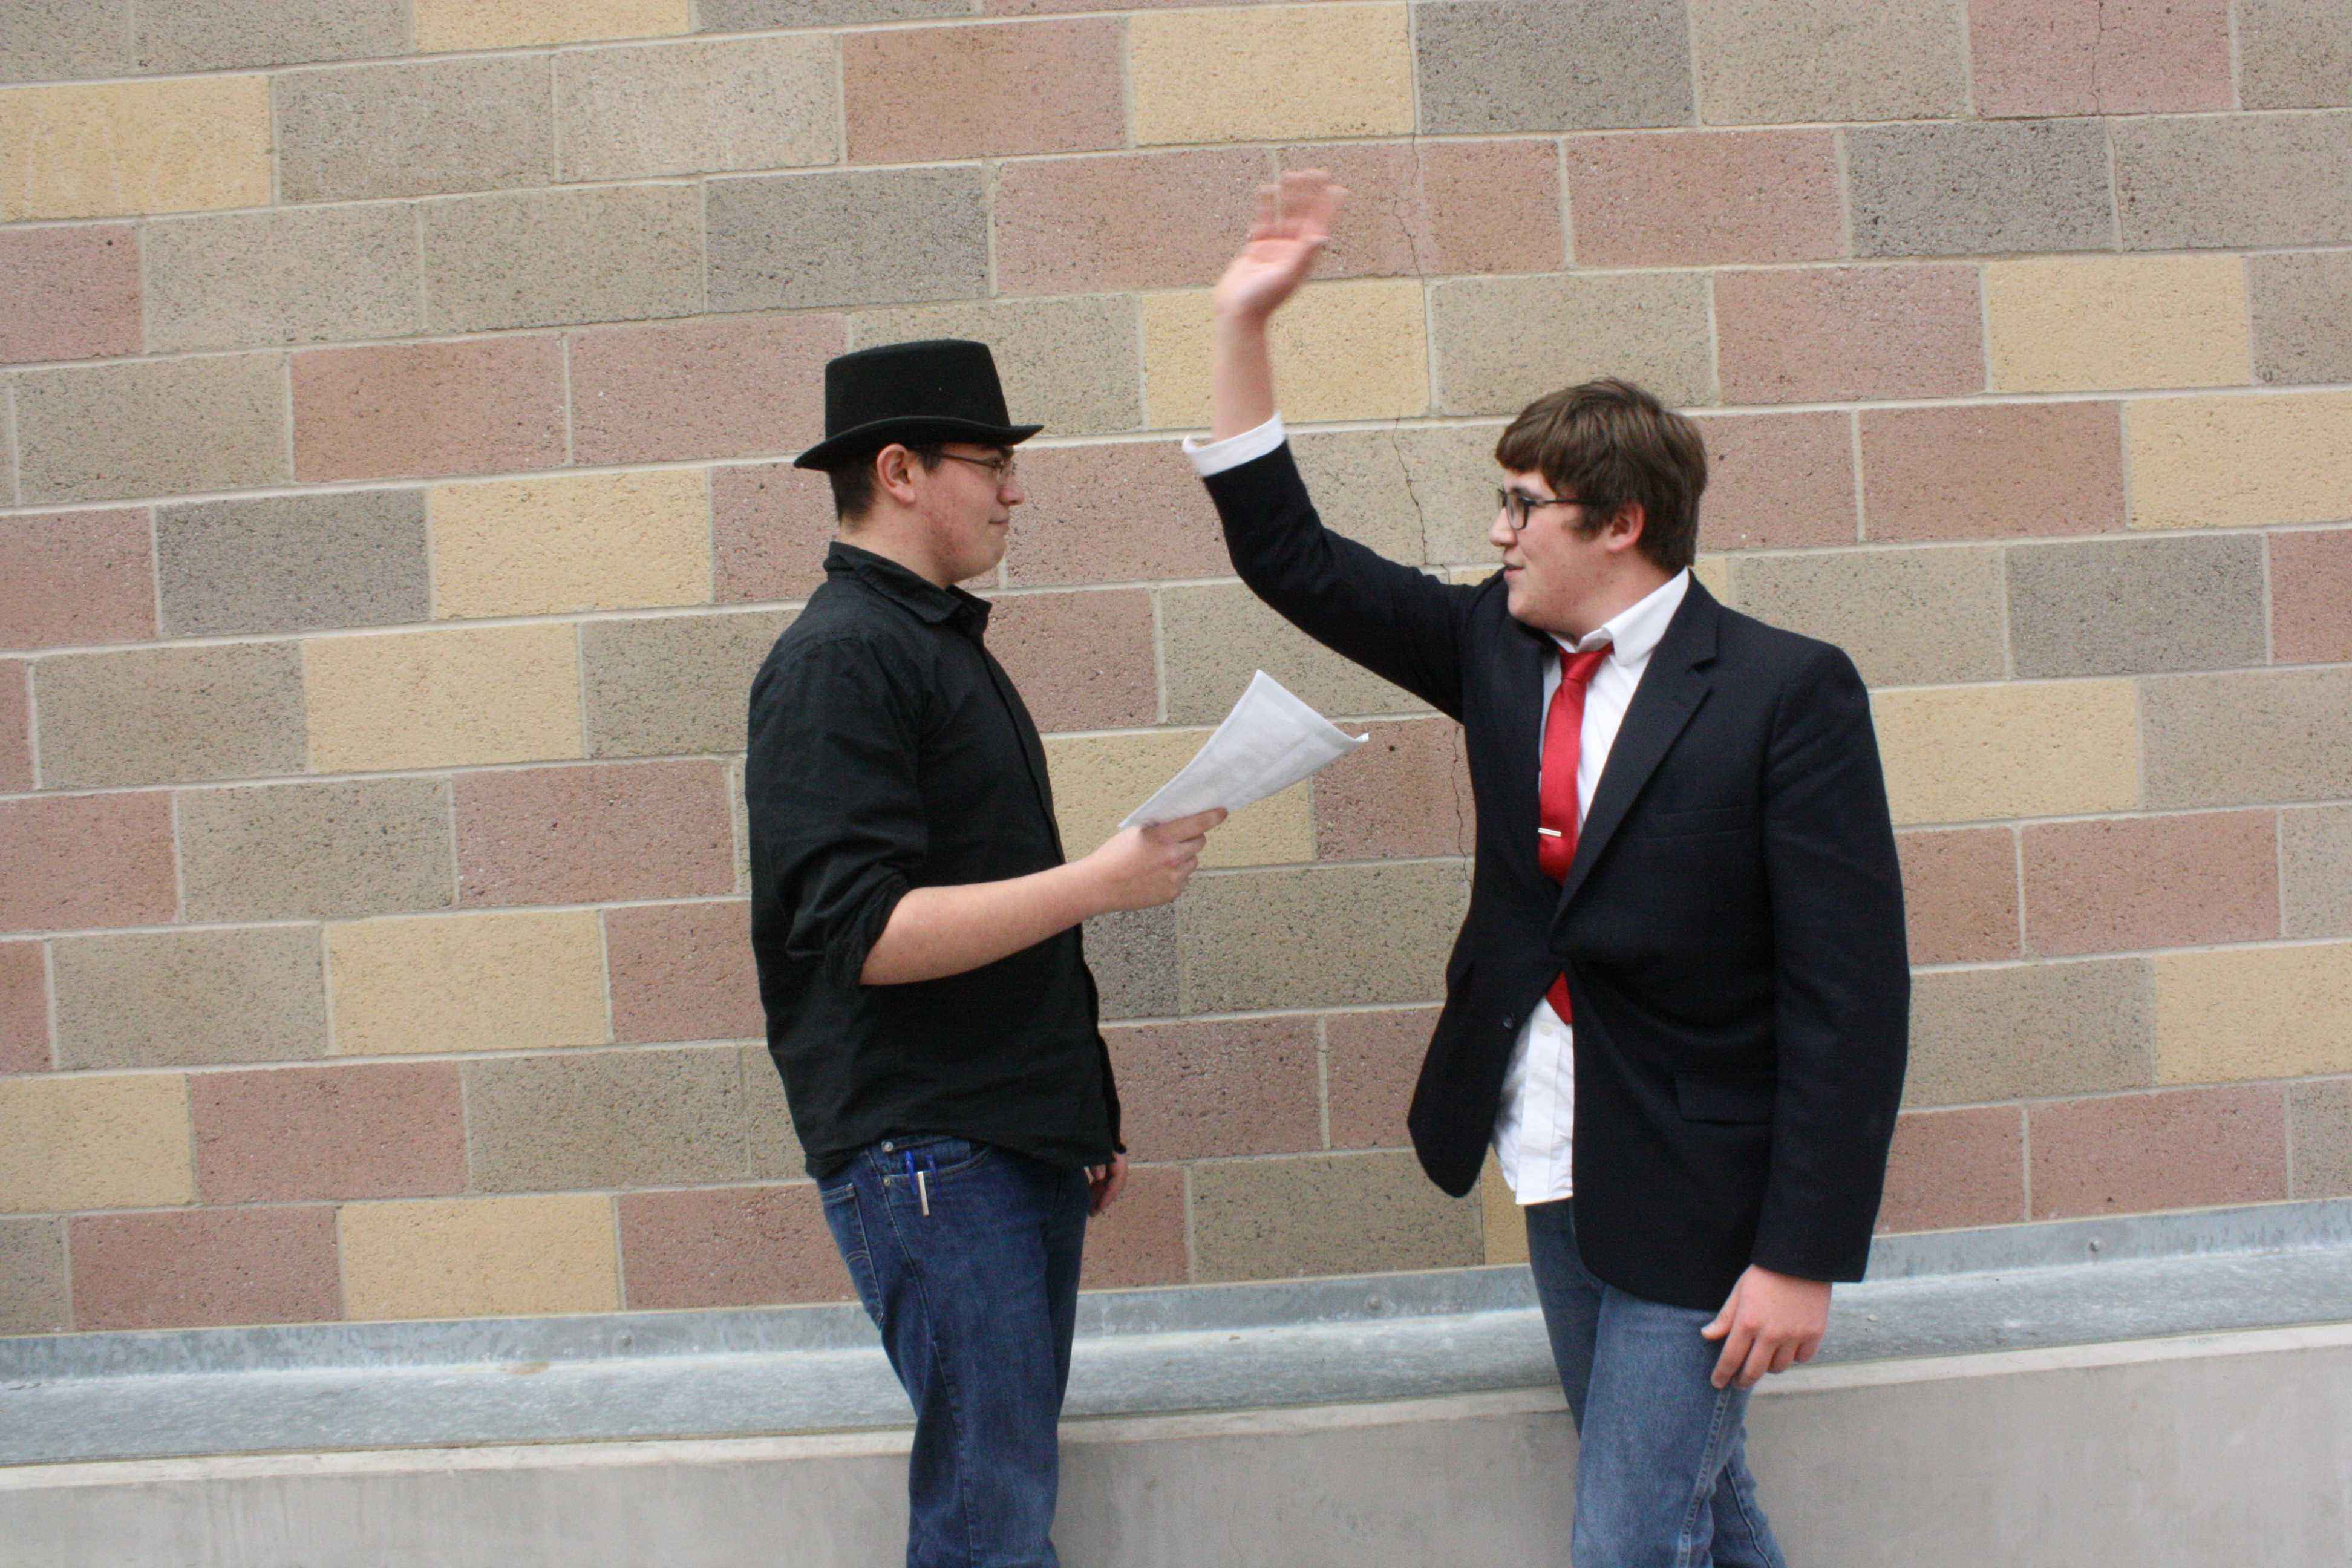 Seniors Daniel Thompson and Bradley Goodwin rehearse a scene for drama class.